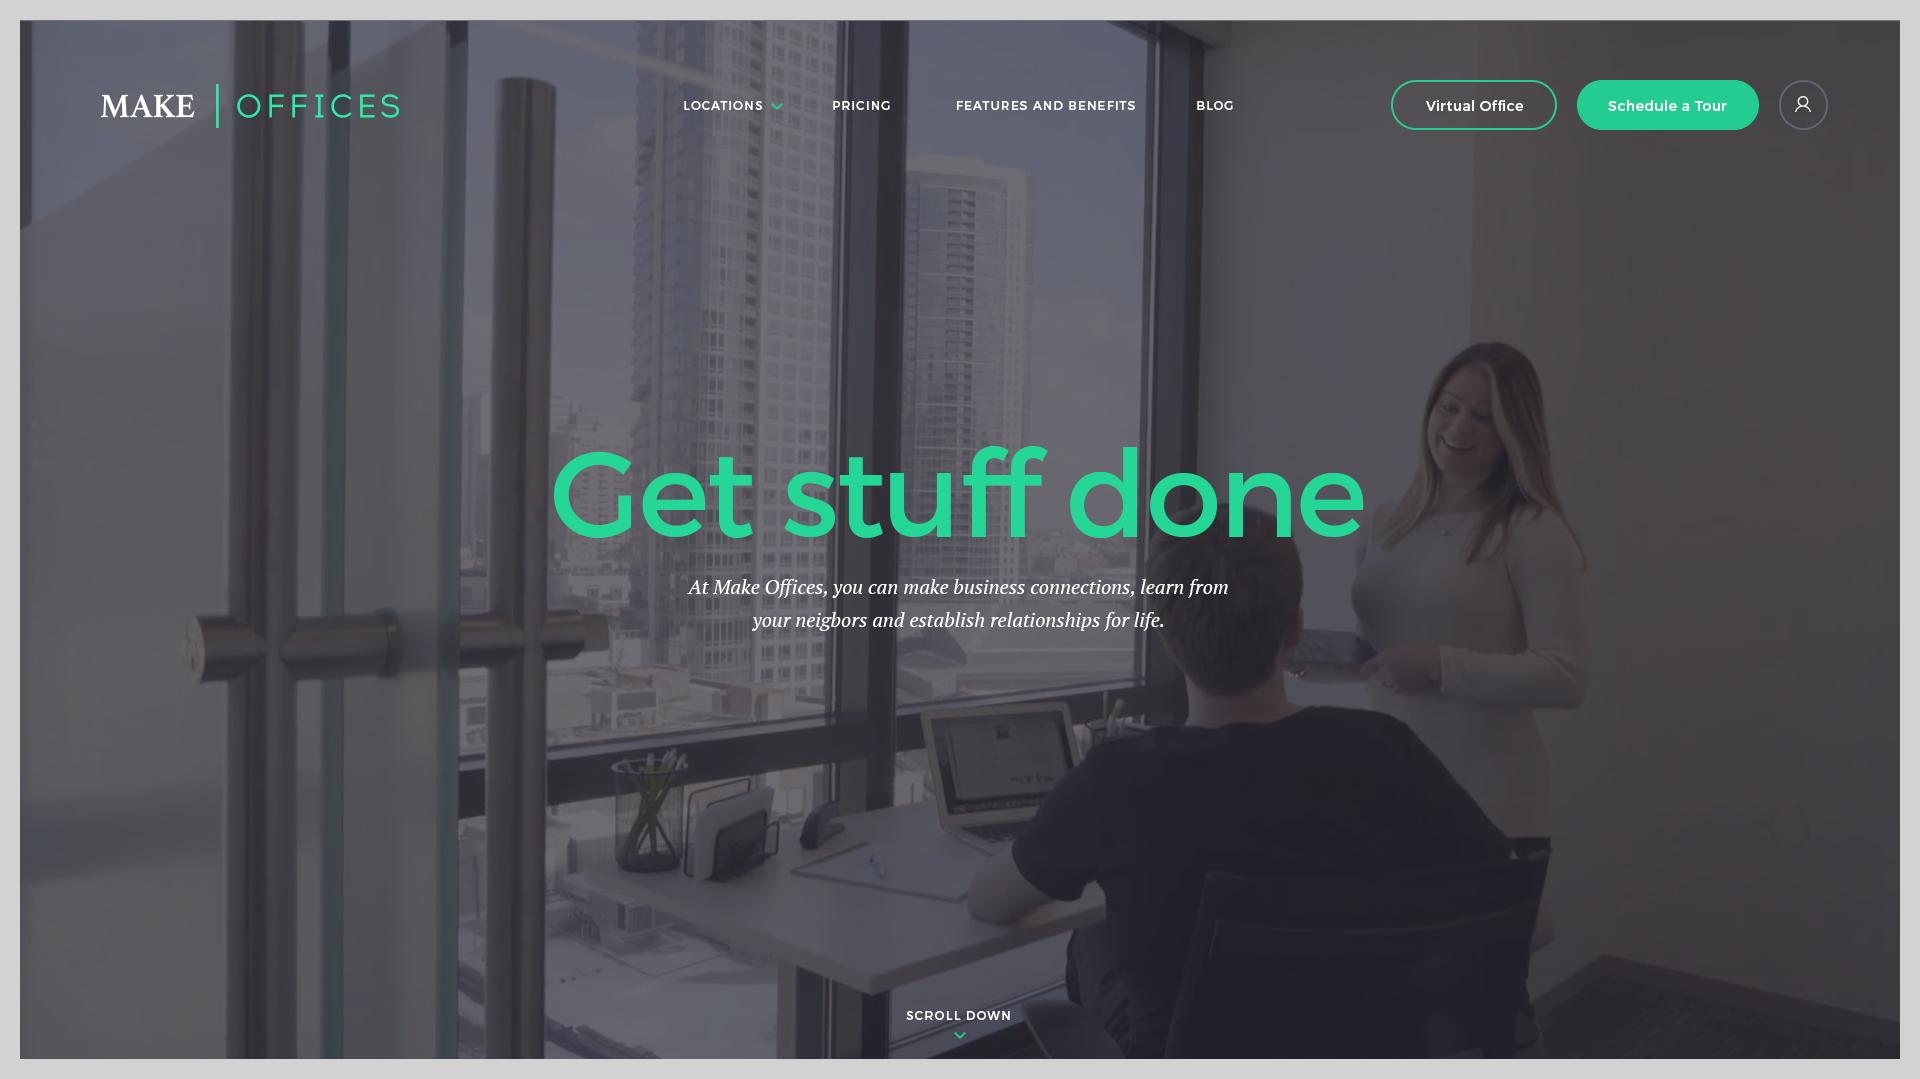 Make offices Website Design Preview